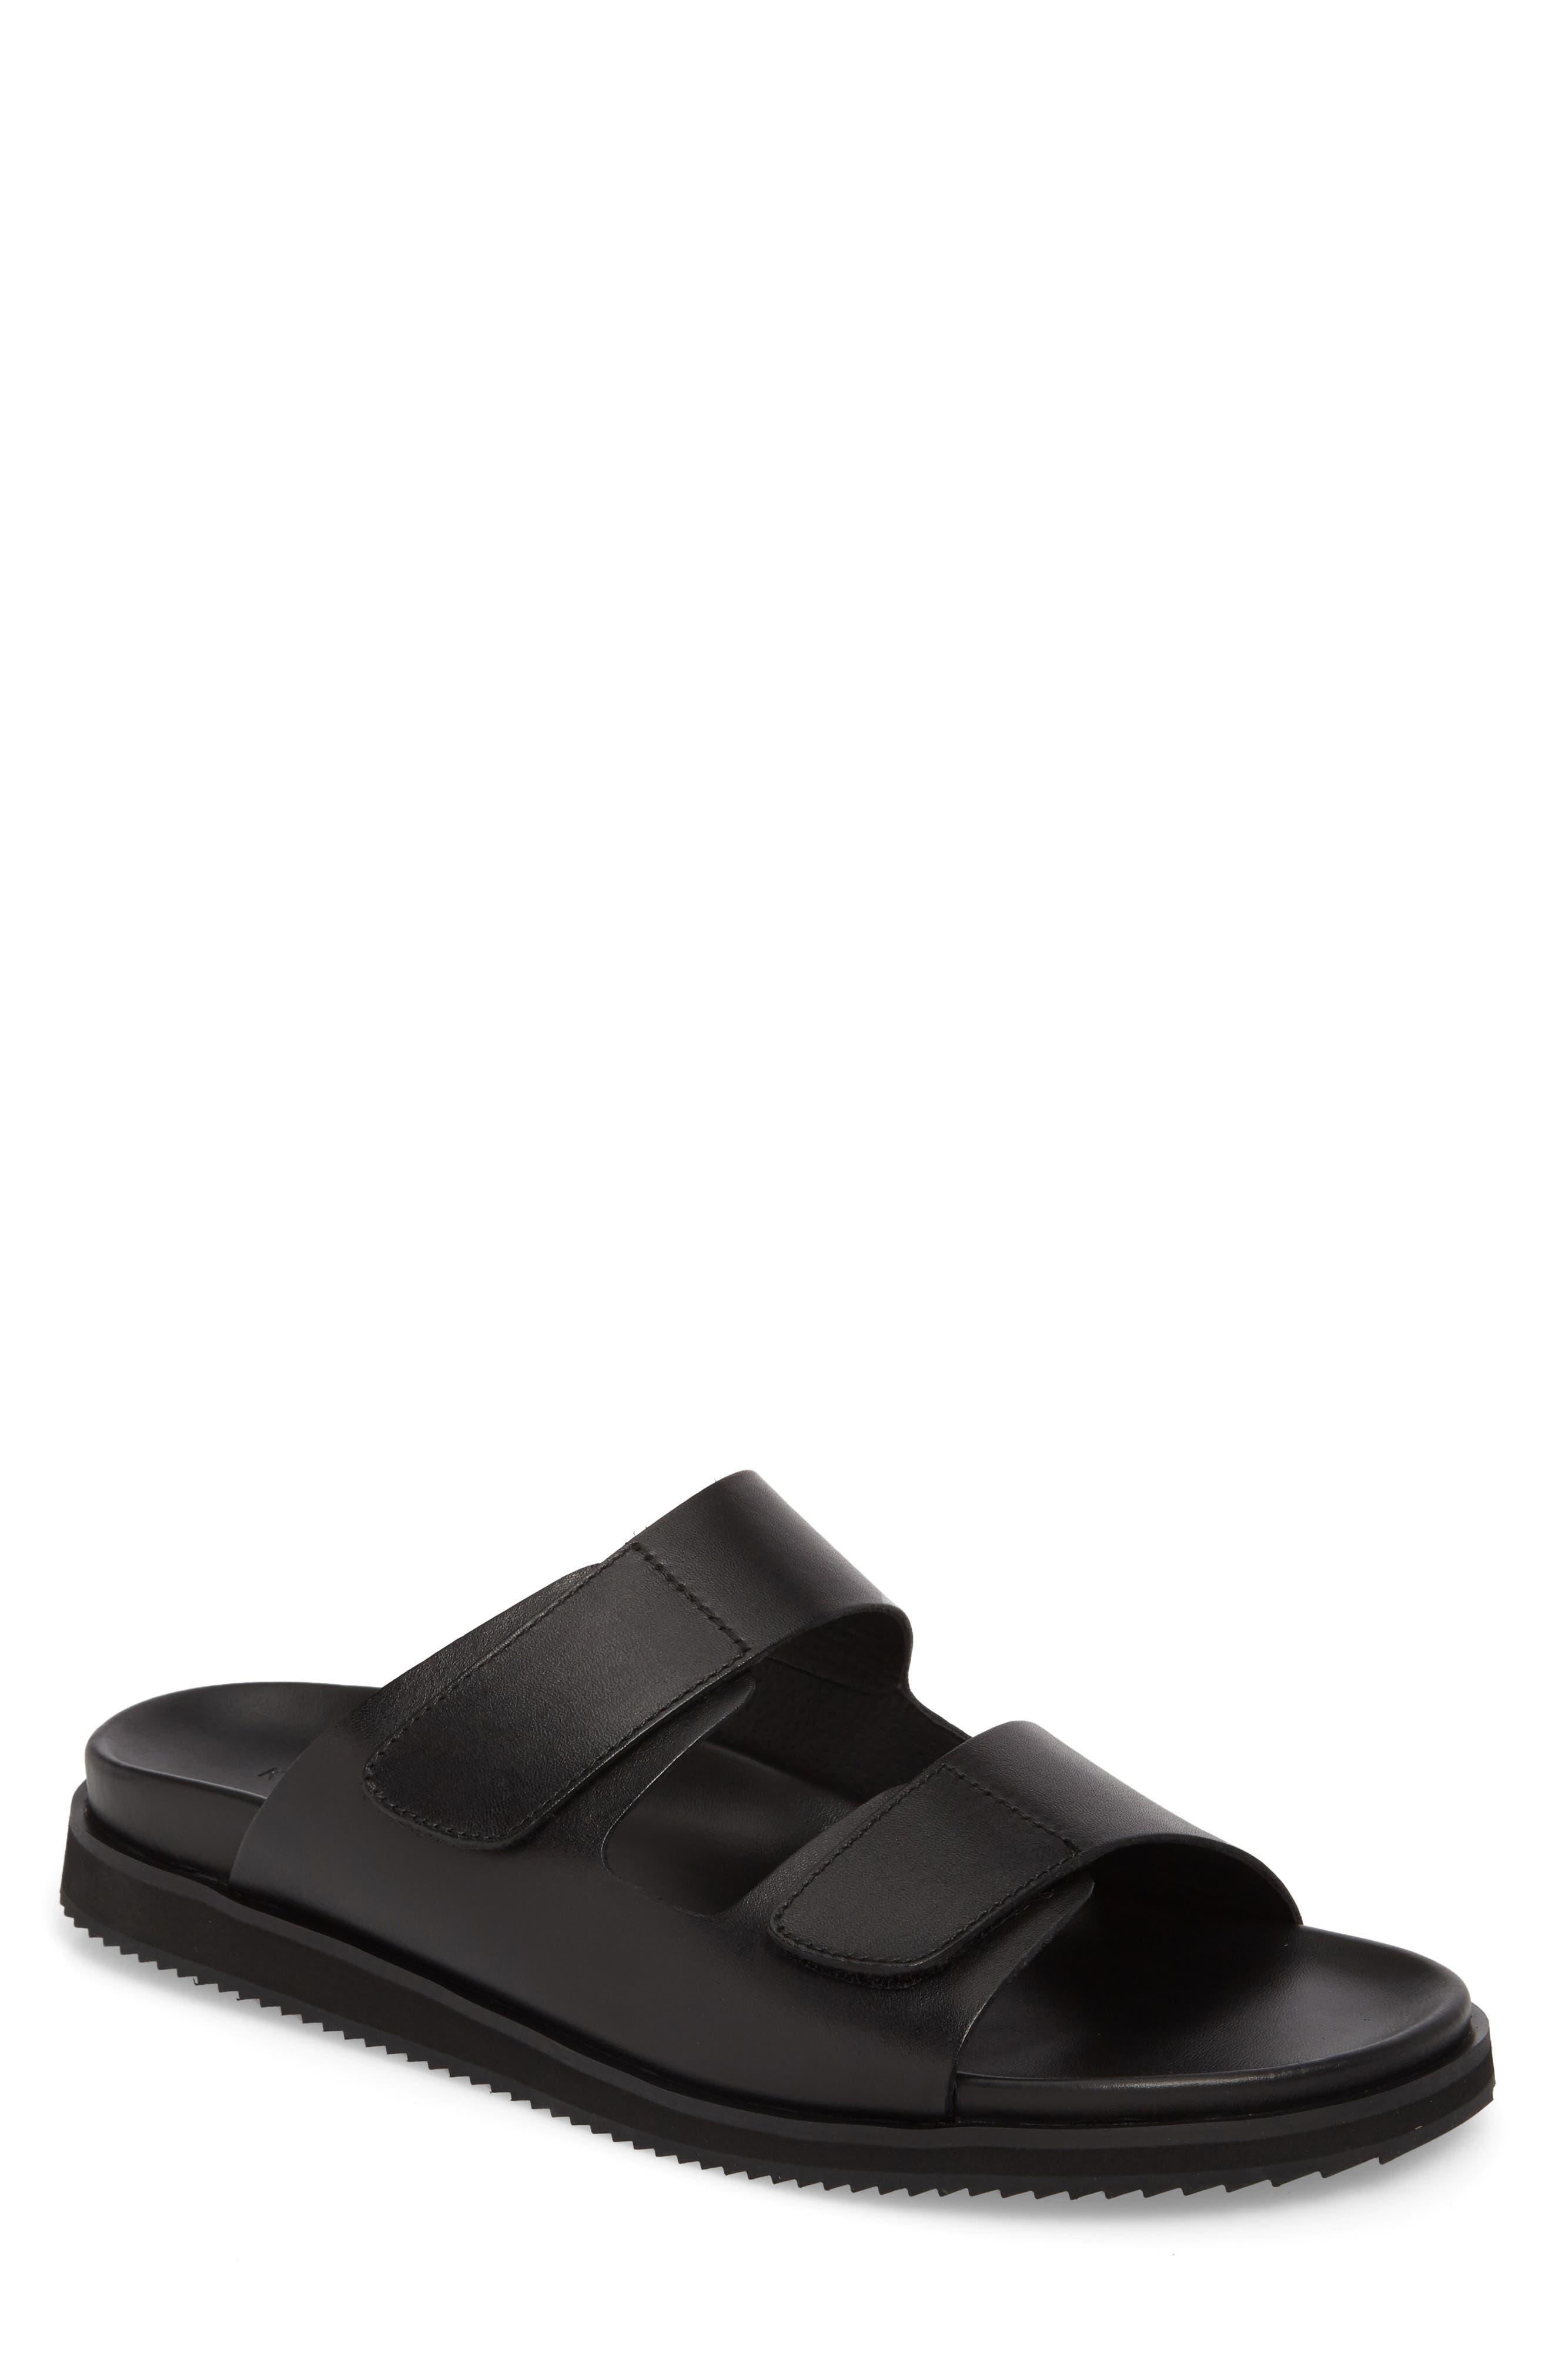 Story Slide Sandal,                             Main thumbnail 1, color,                             Black Leather